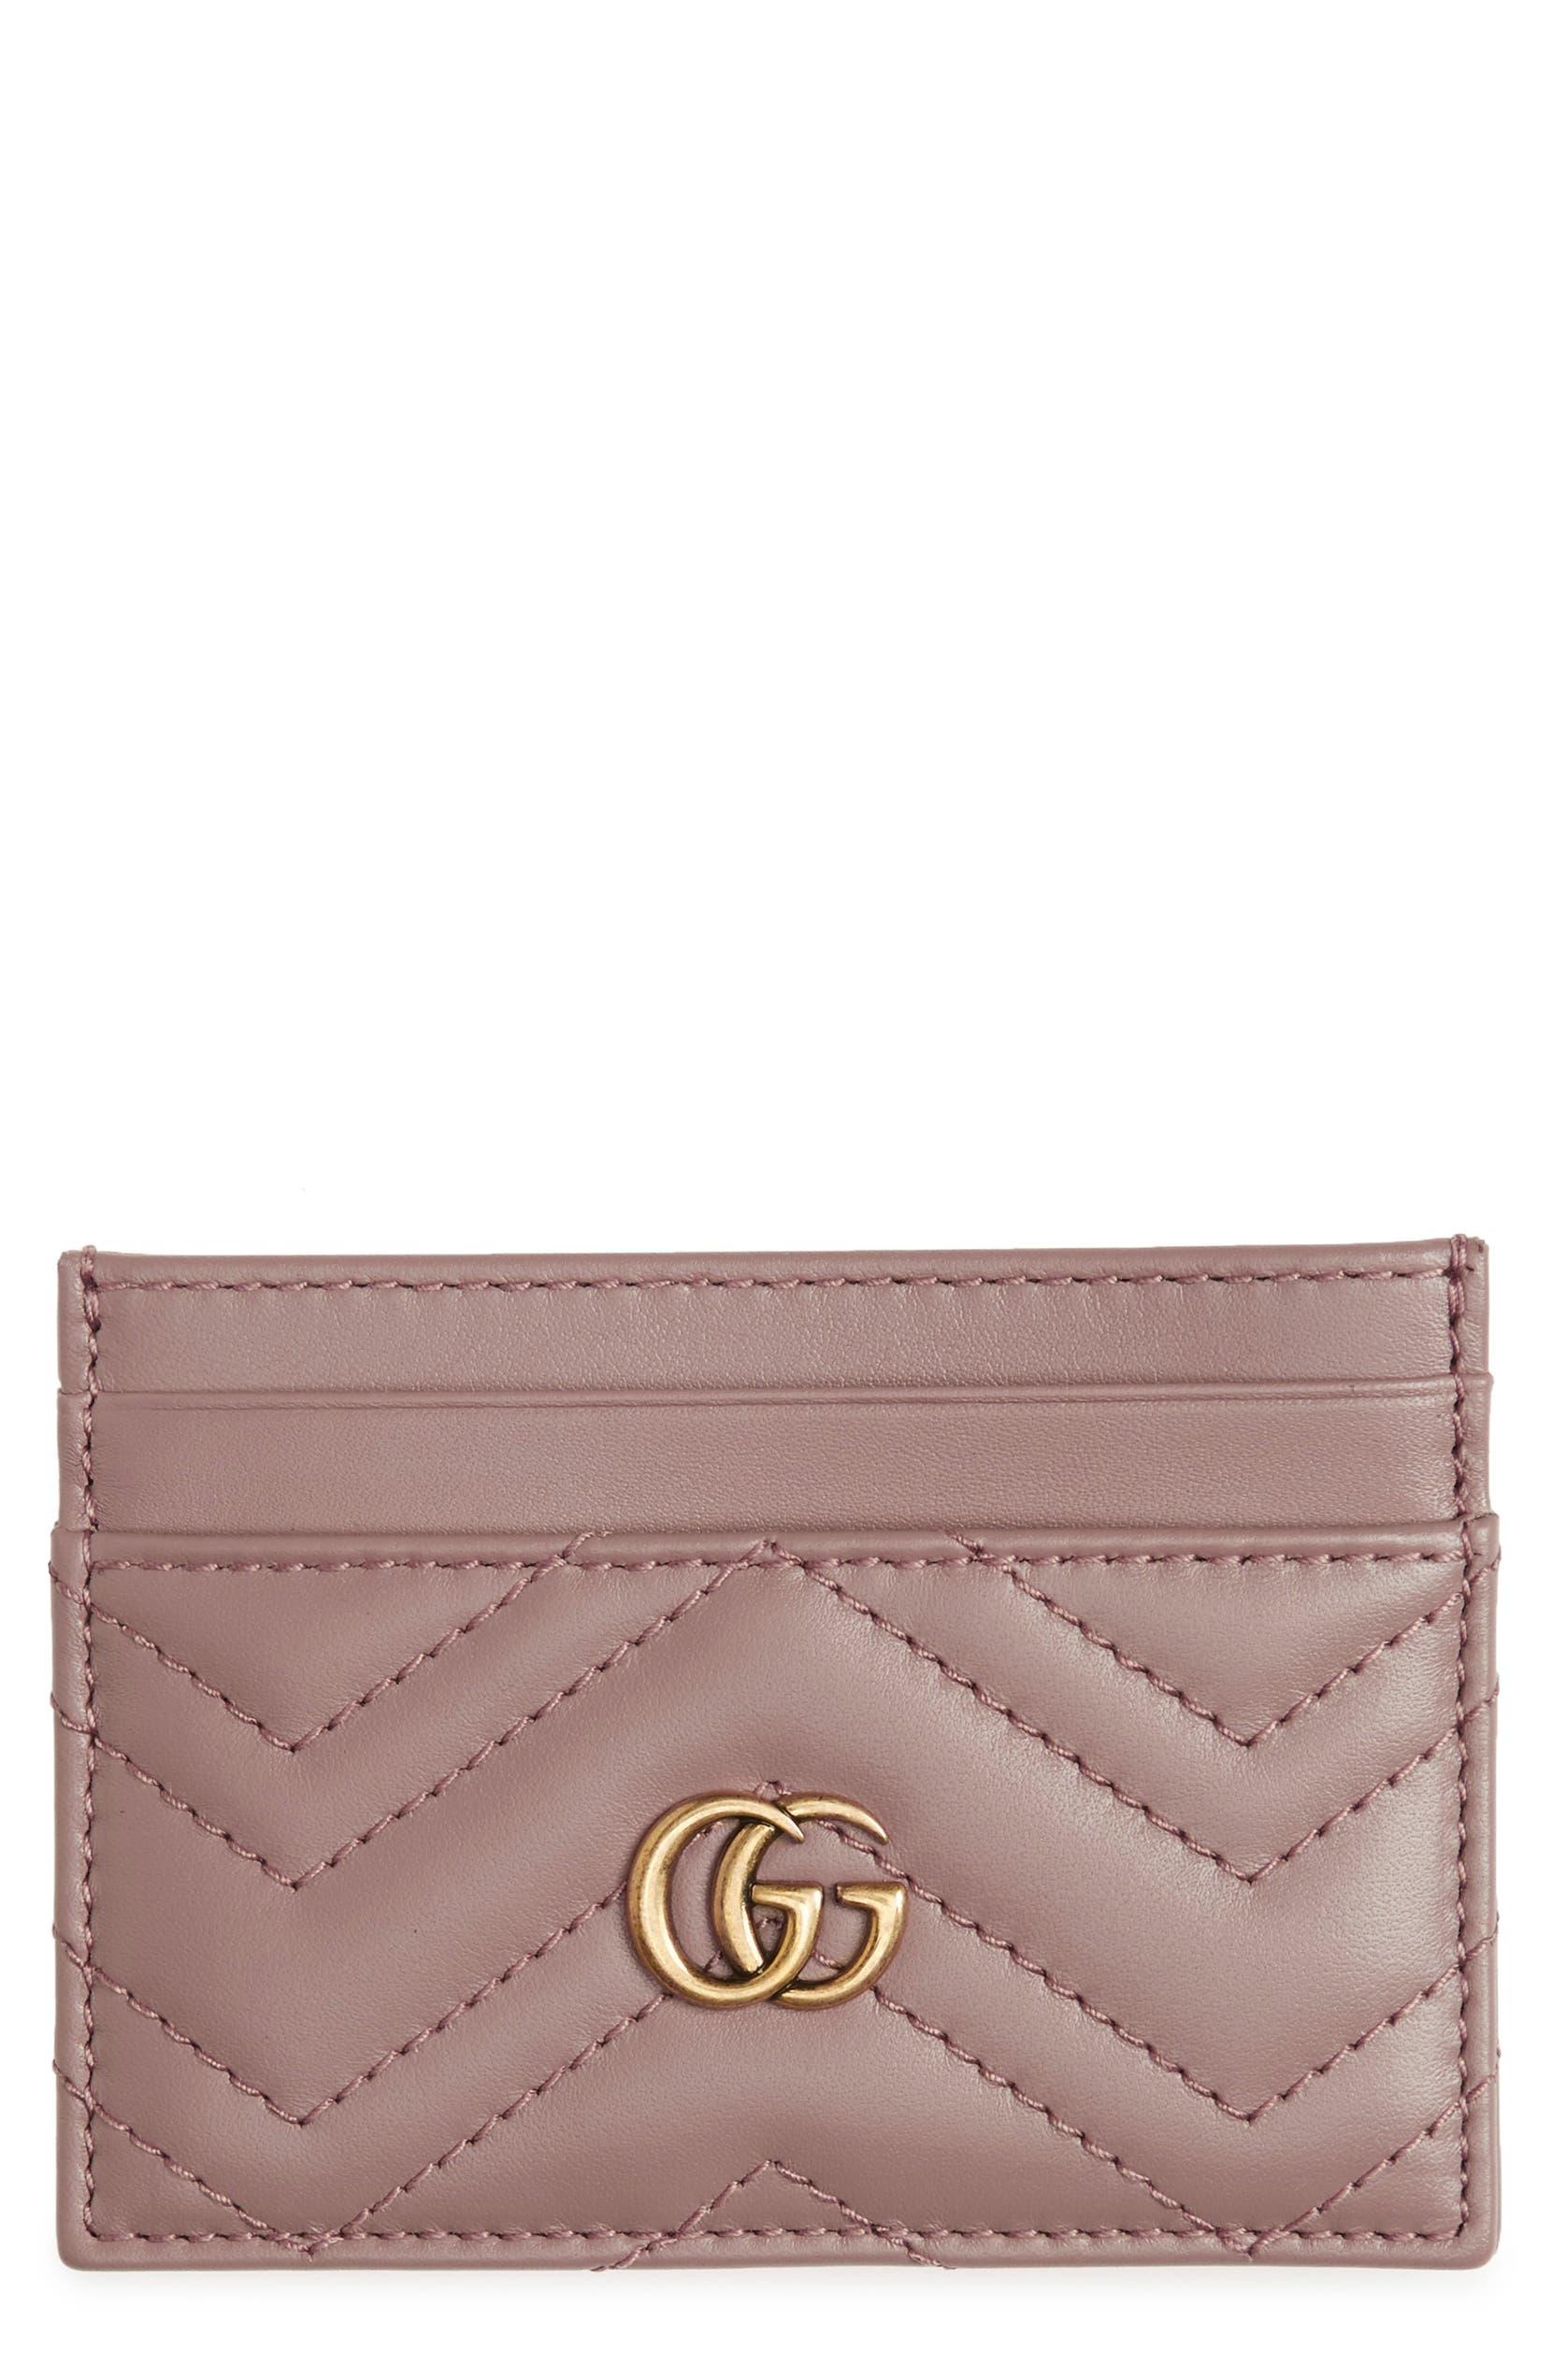 4bb20a850 Gucci GG Marmont Matelassé Leather Card Case | Nordstrom